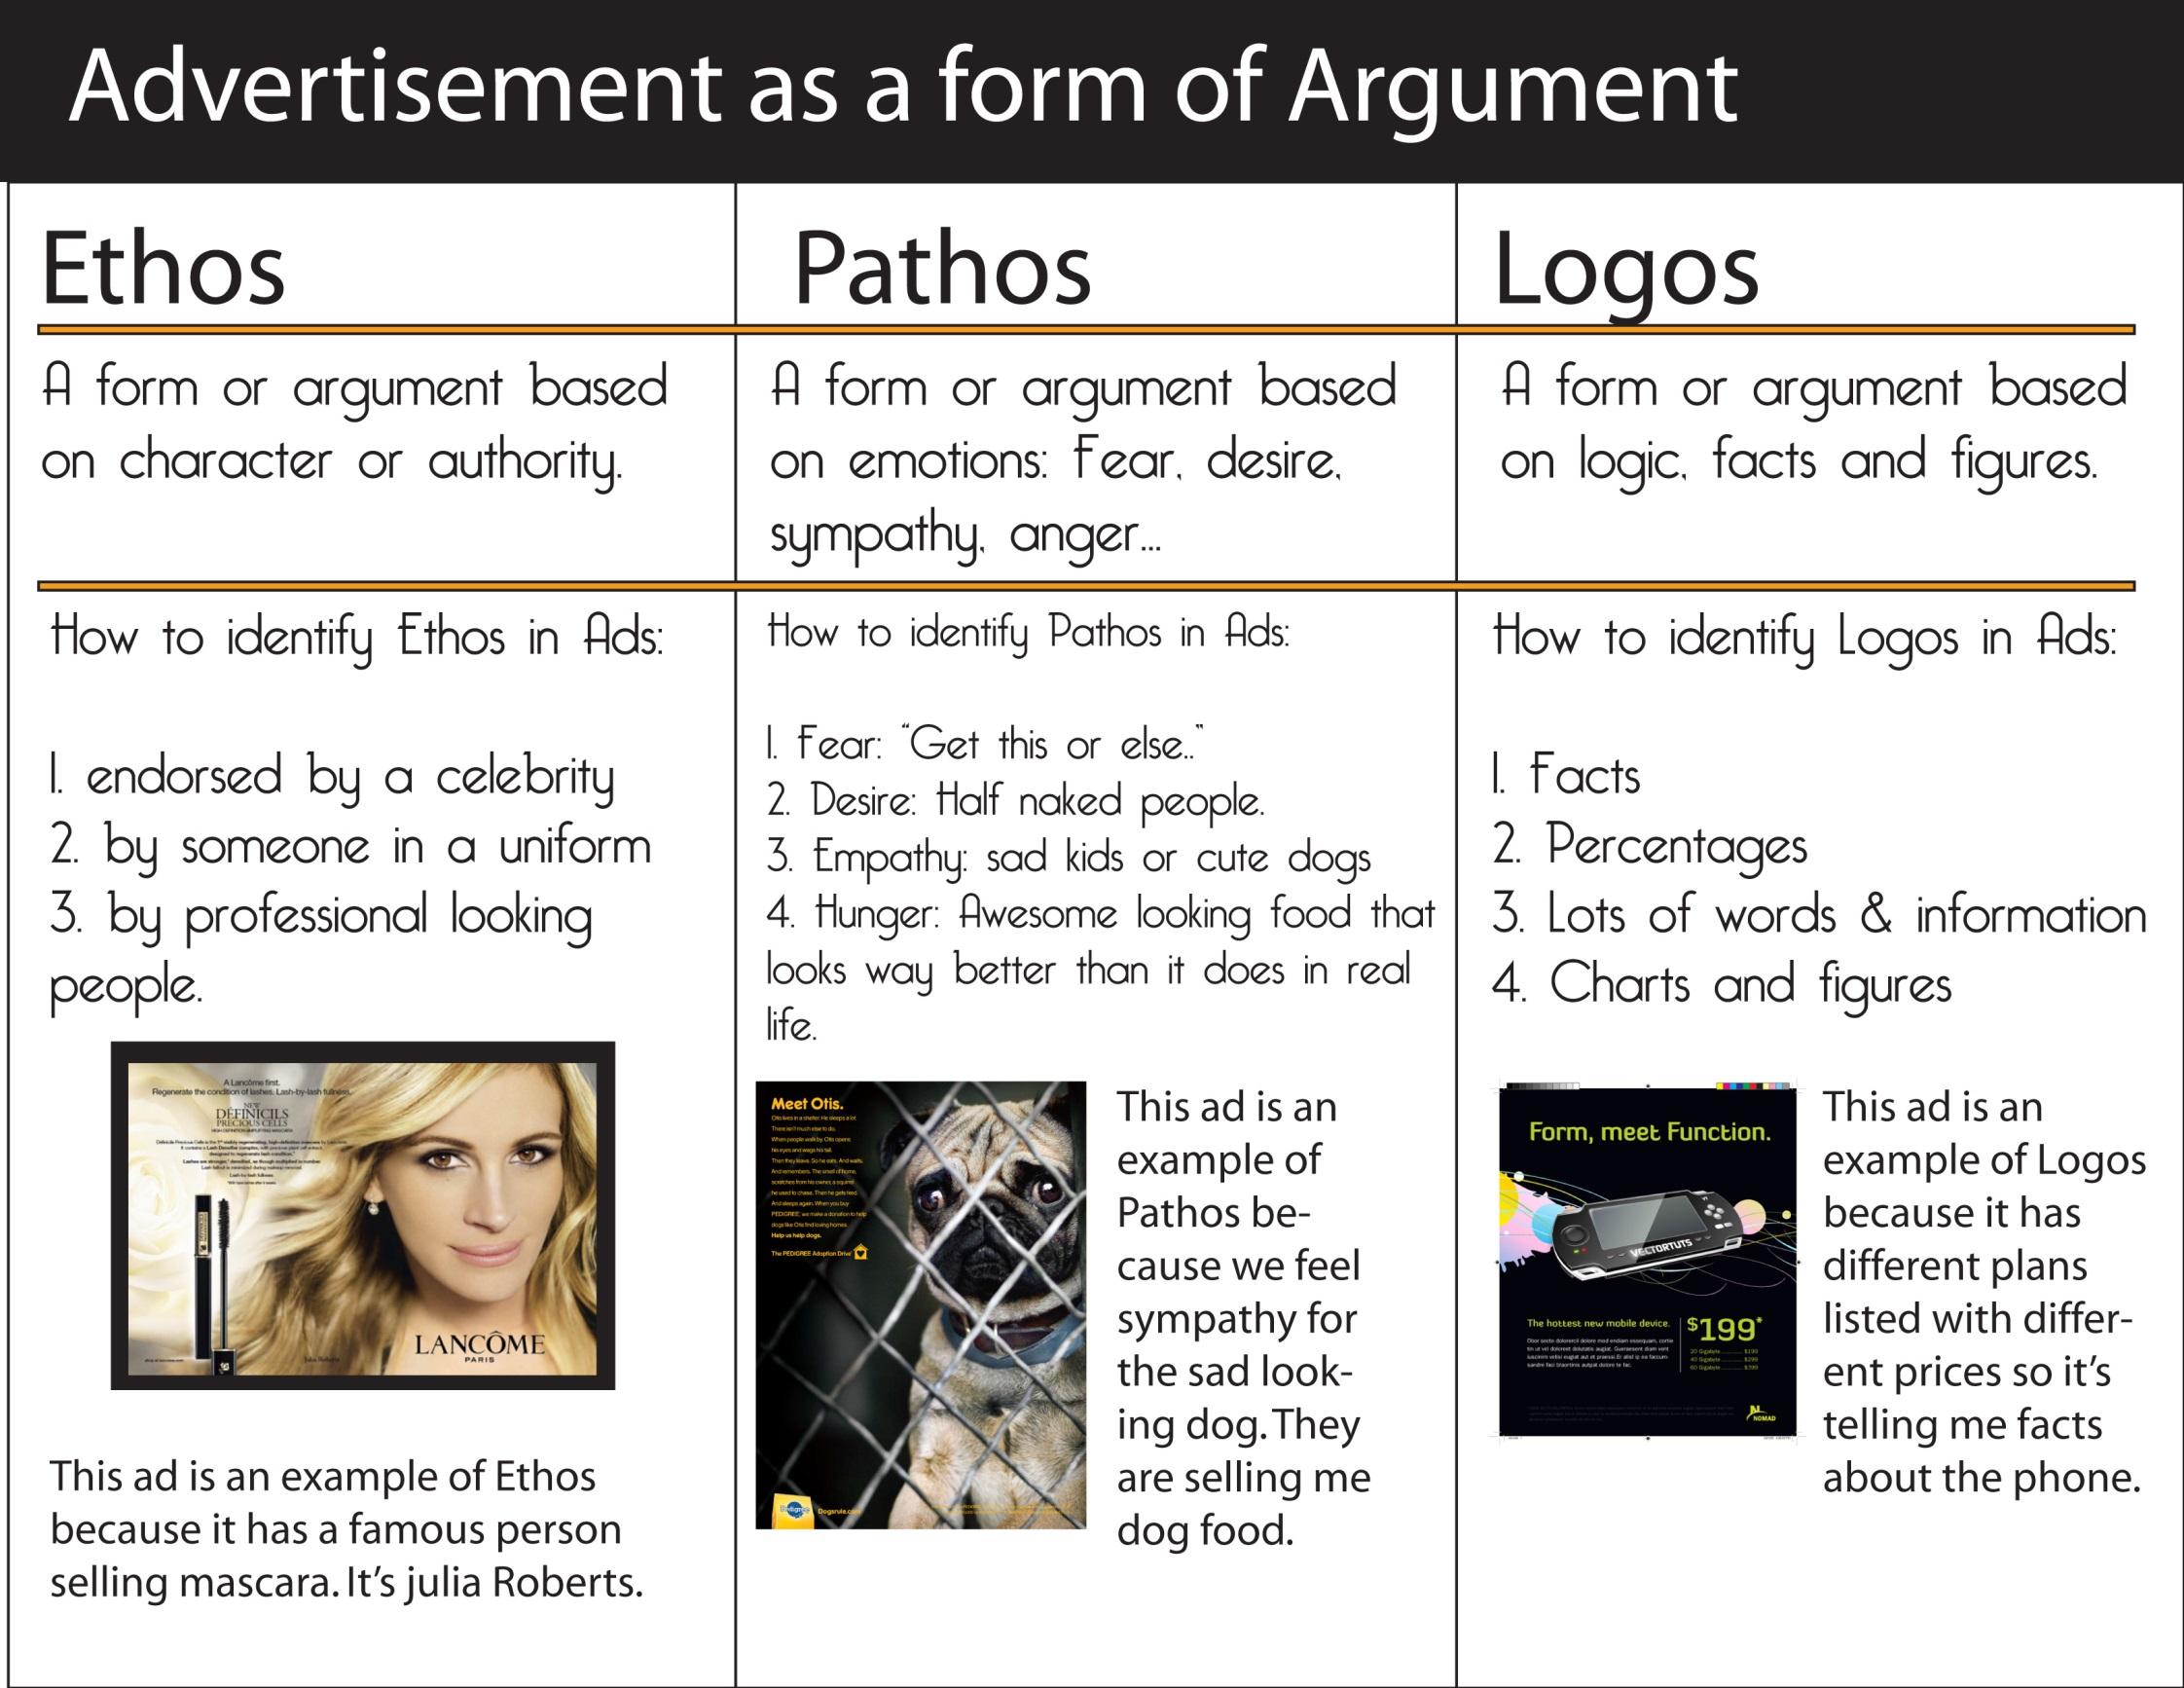 Ad Analysis Essay Ethos Pathos Logos Lesson - image 5